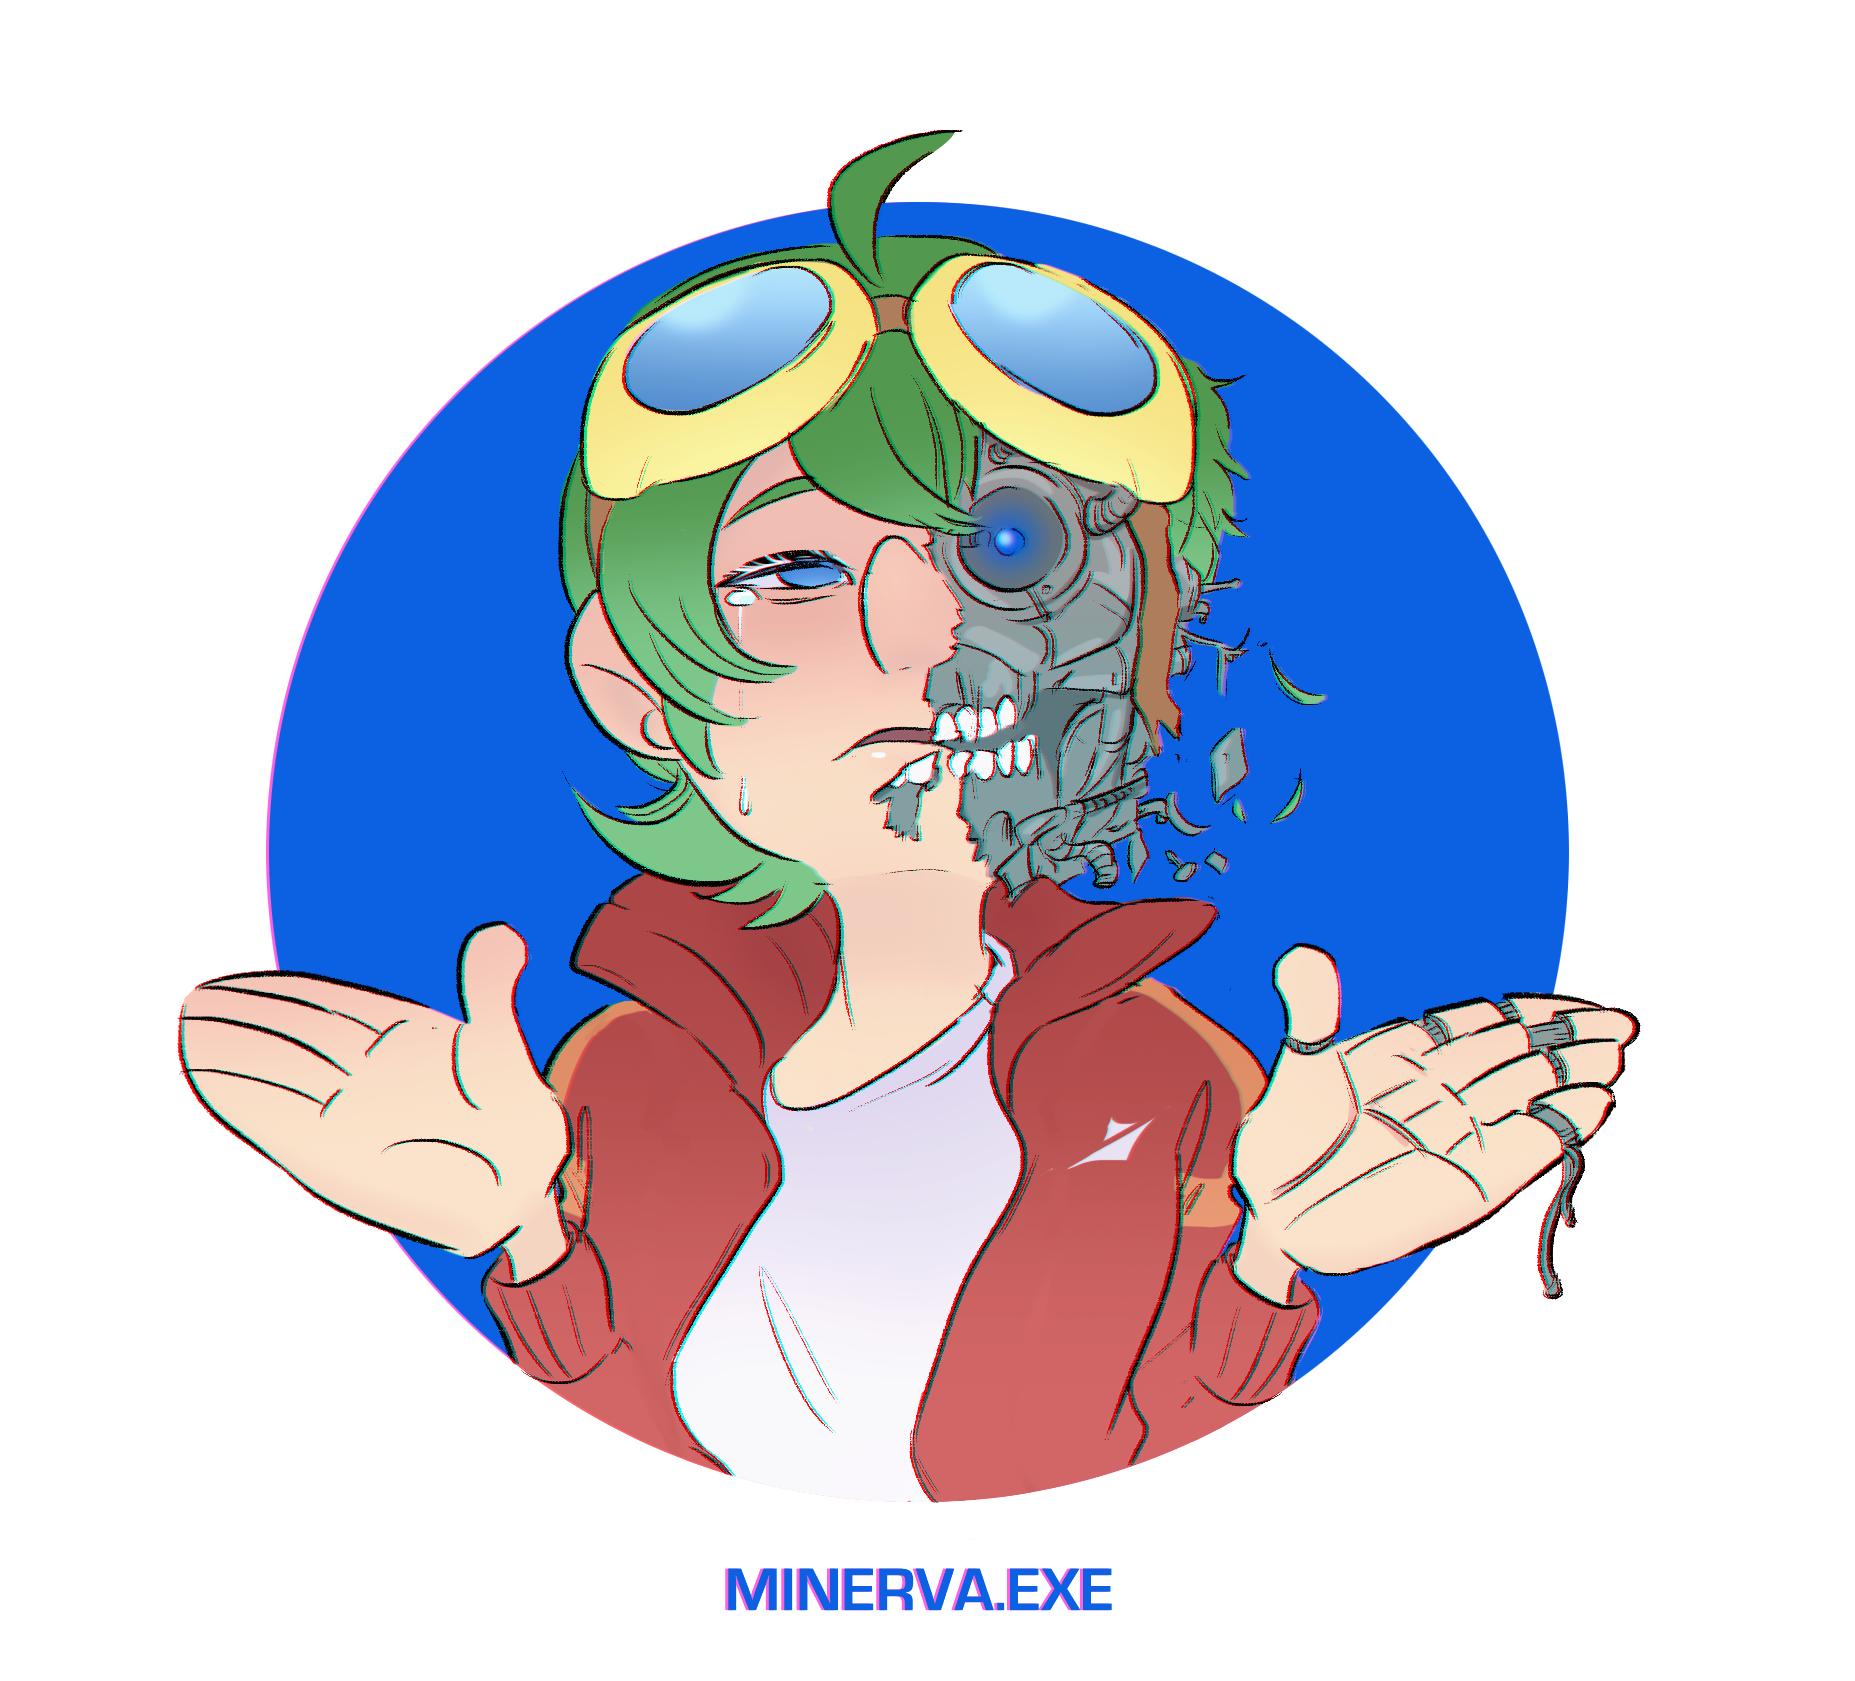 Minerva.exe